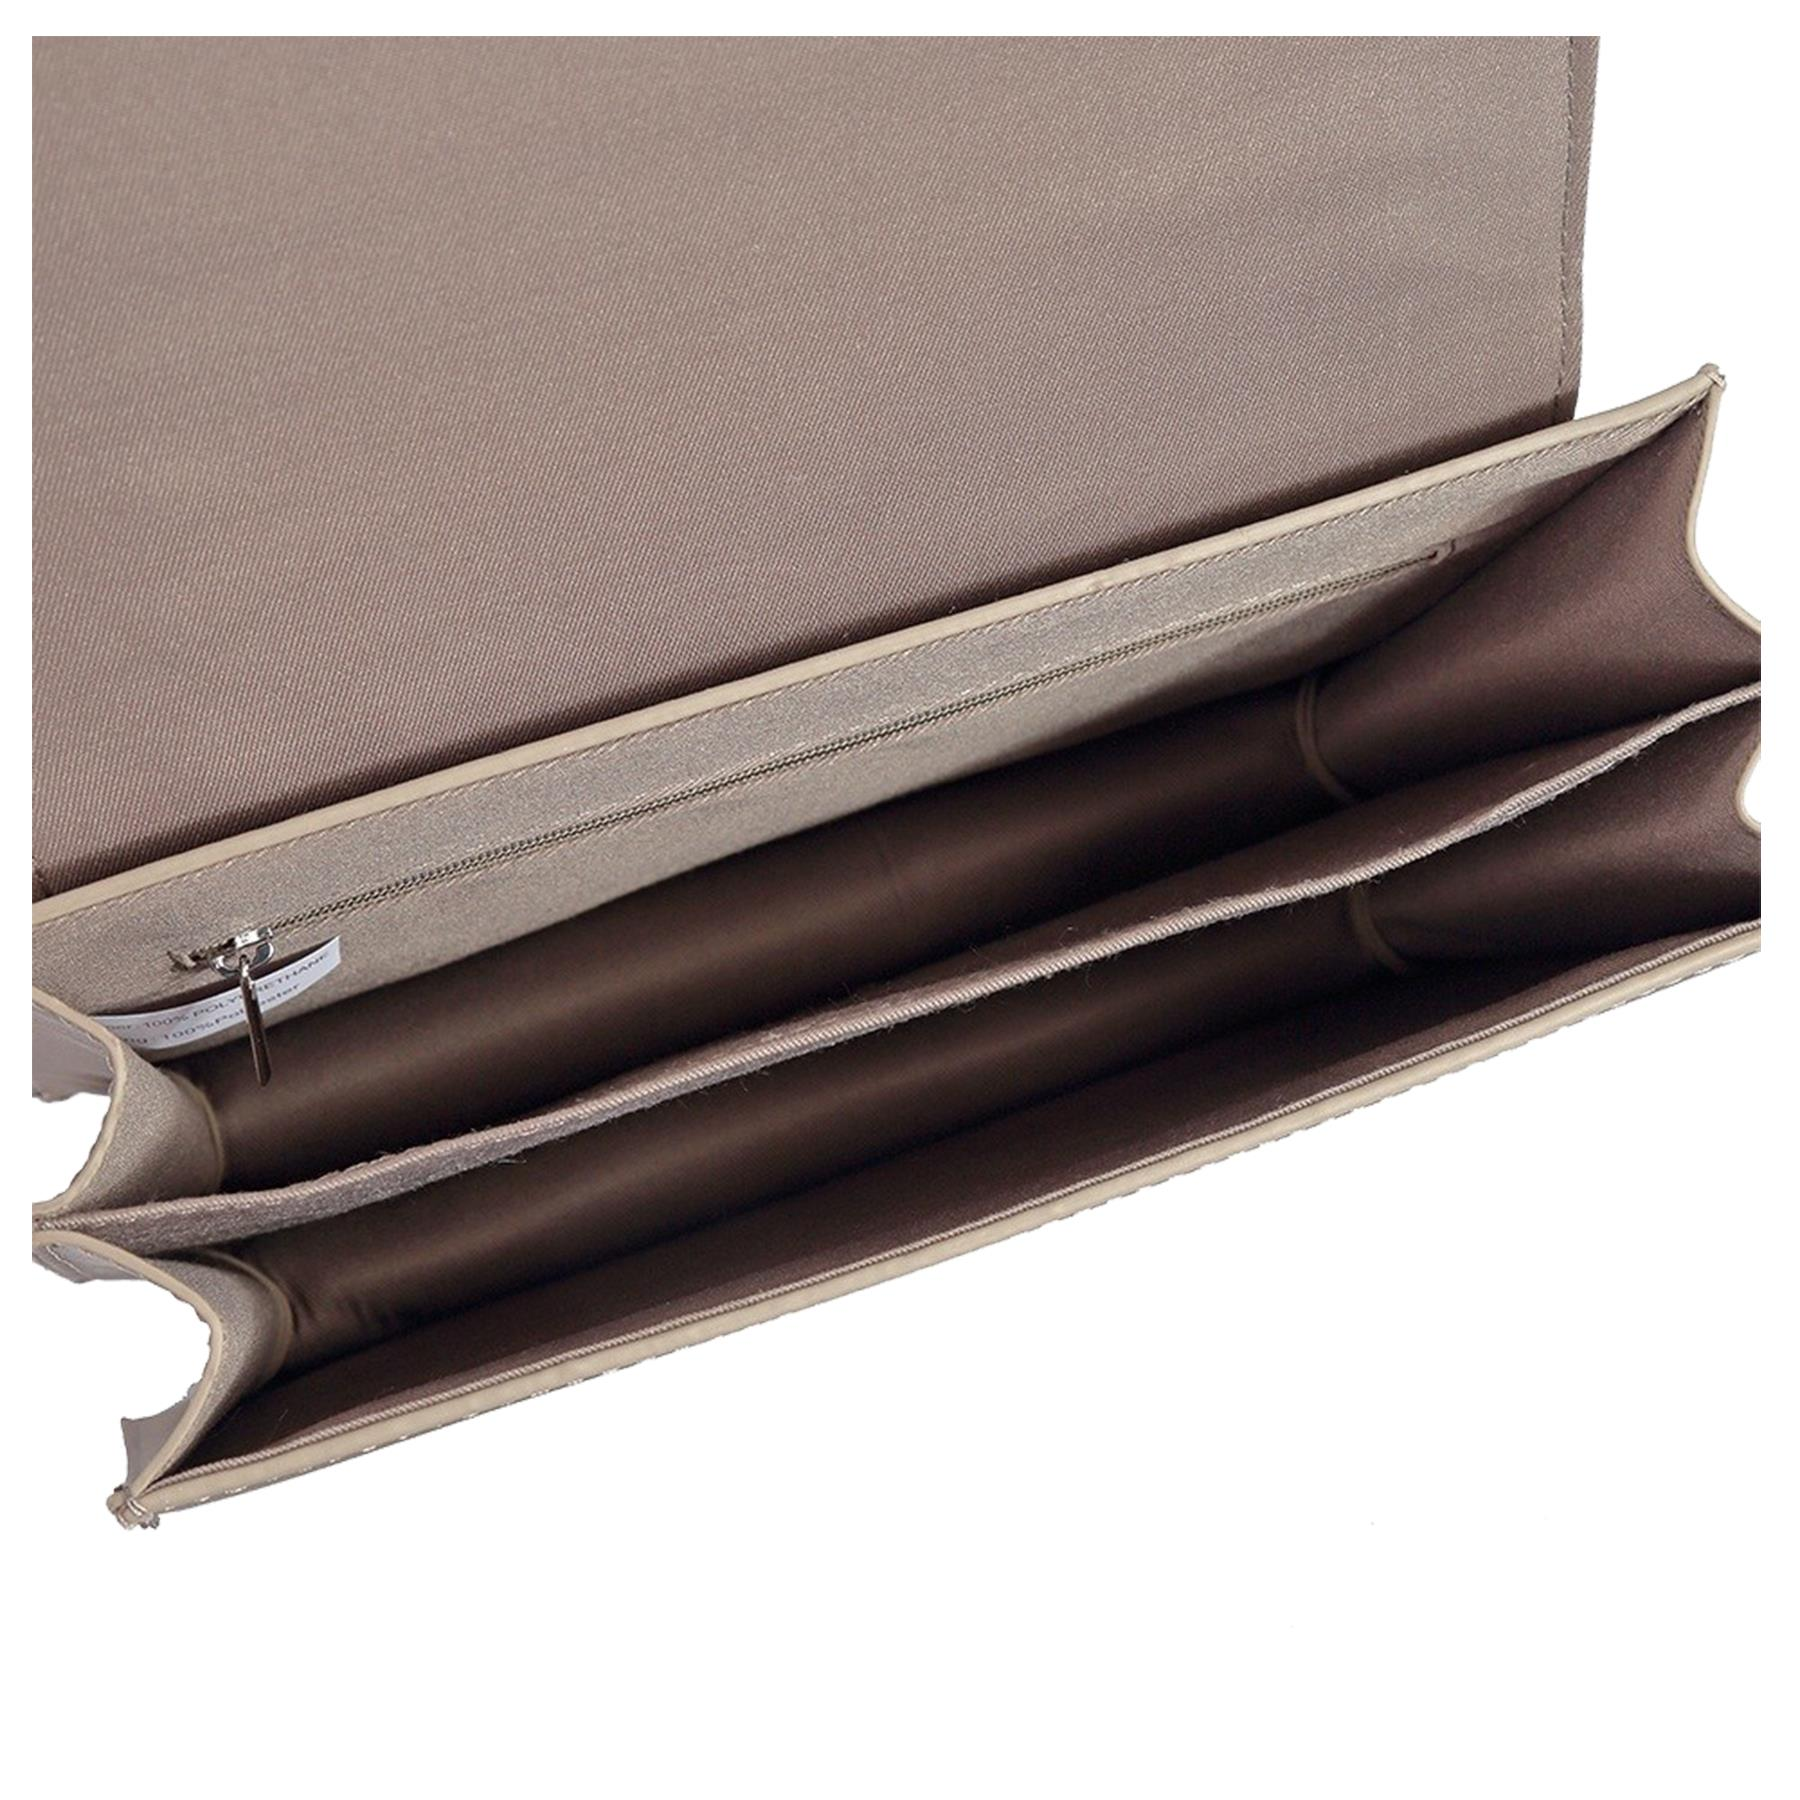 New-Women-s-Faux-Leather-Elegant-Stylish-Fashion-Shoulder-Clutch-Bag thumbnail 13